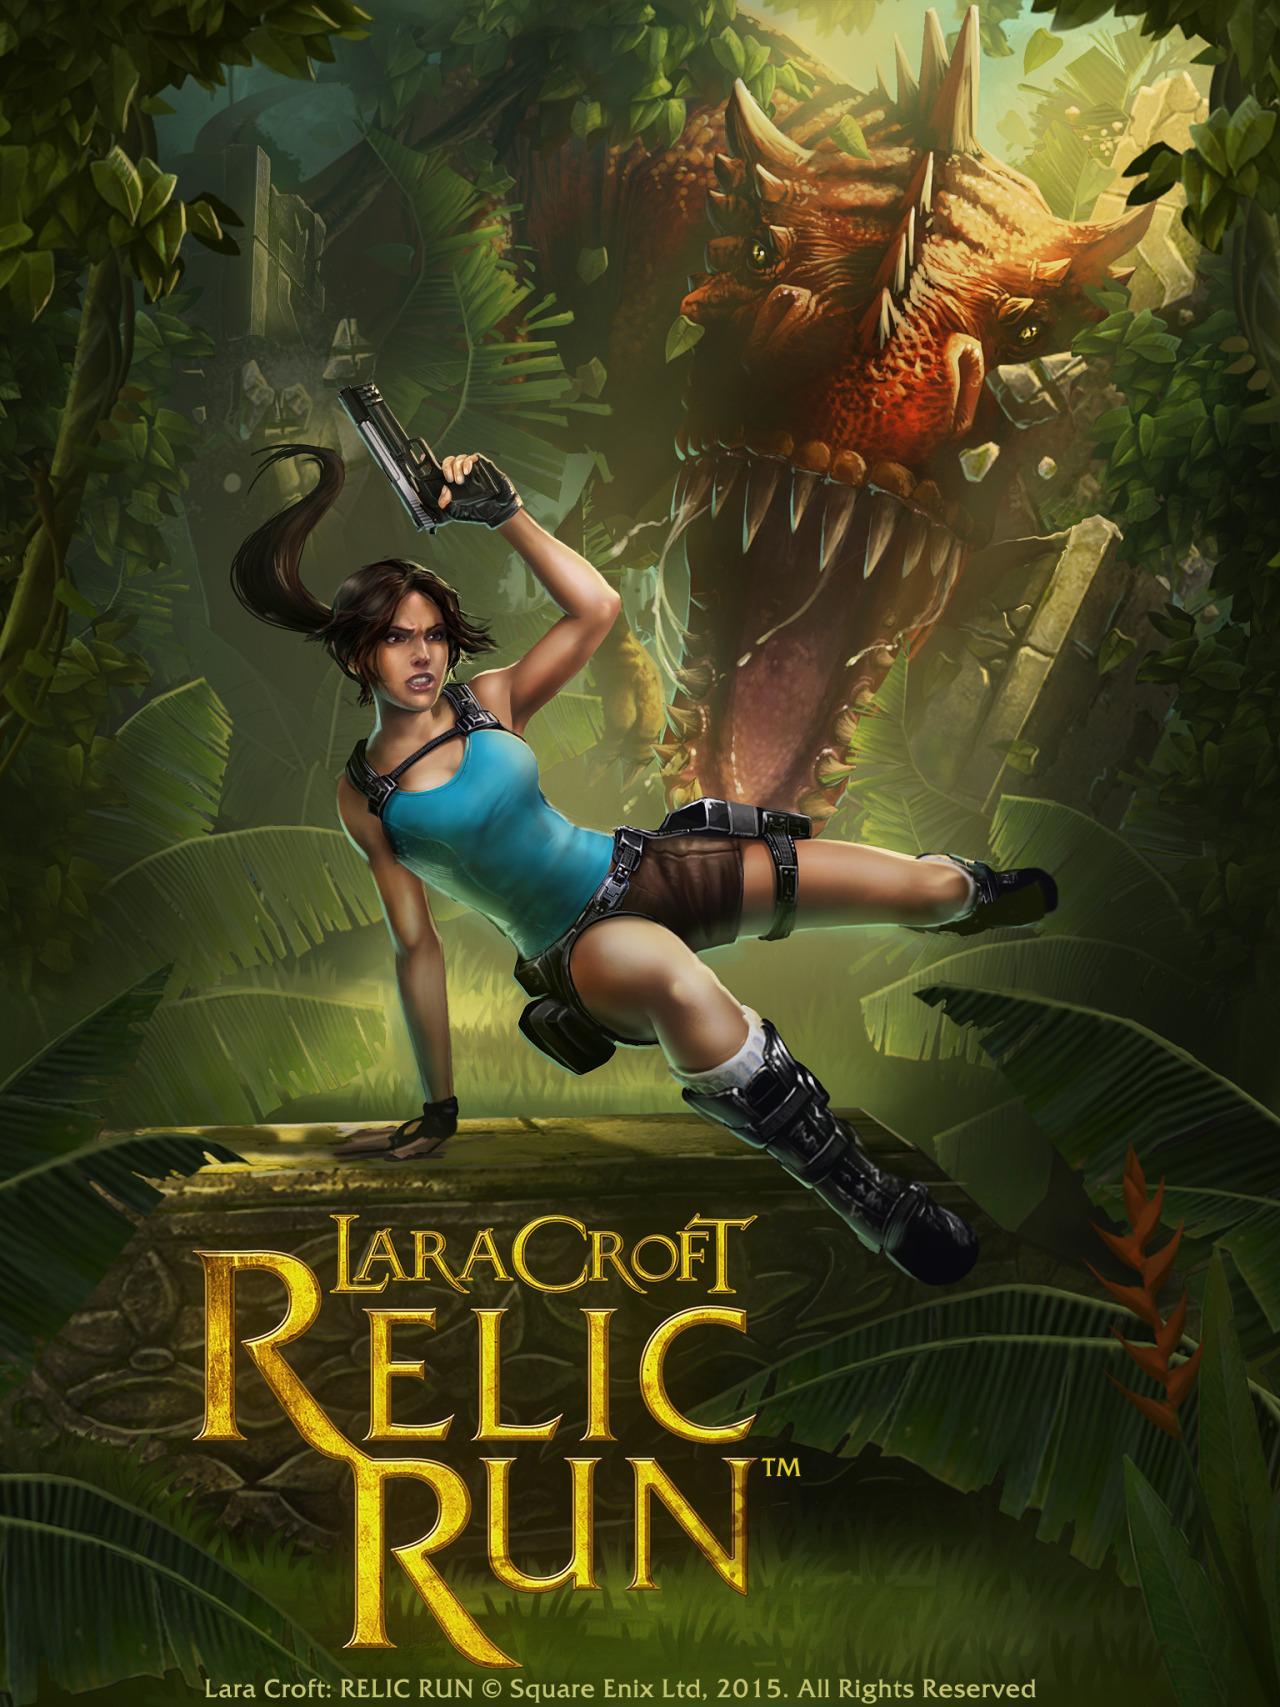 TR-RelicRun01-culturageek.com.ar